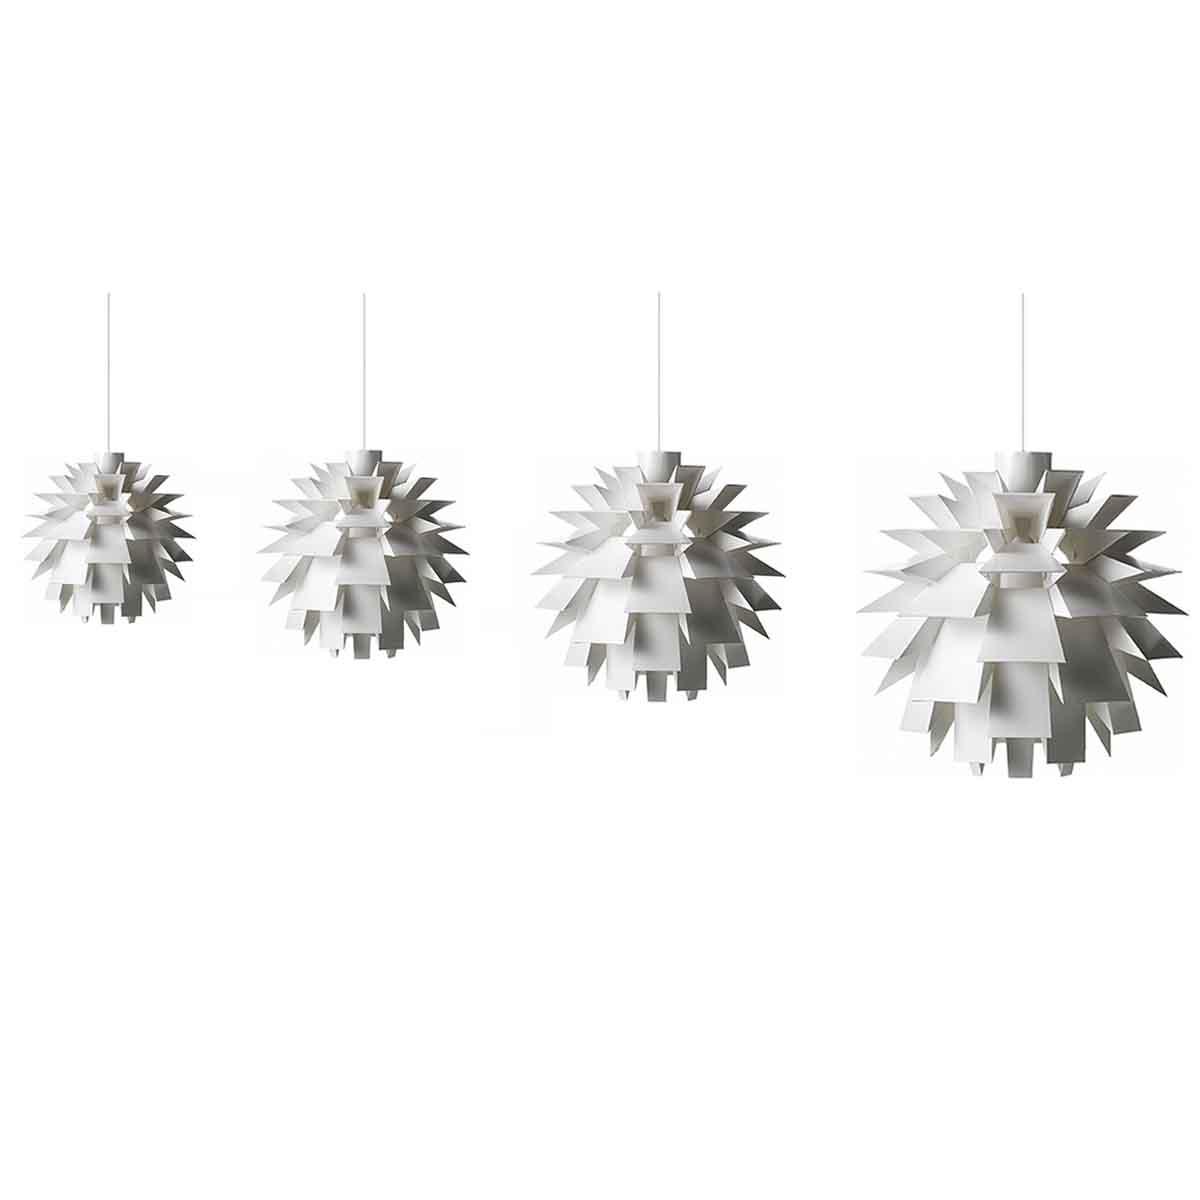 normann copenhagen norm 69 lampe small wei h he 42 cm m bel lampen leuchten pendelleuchten. Black Bedroom Furniture Sets. Home Design Ideas